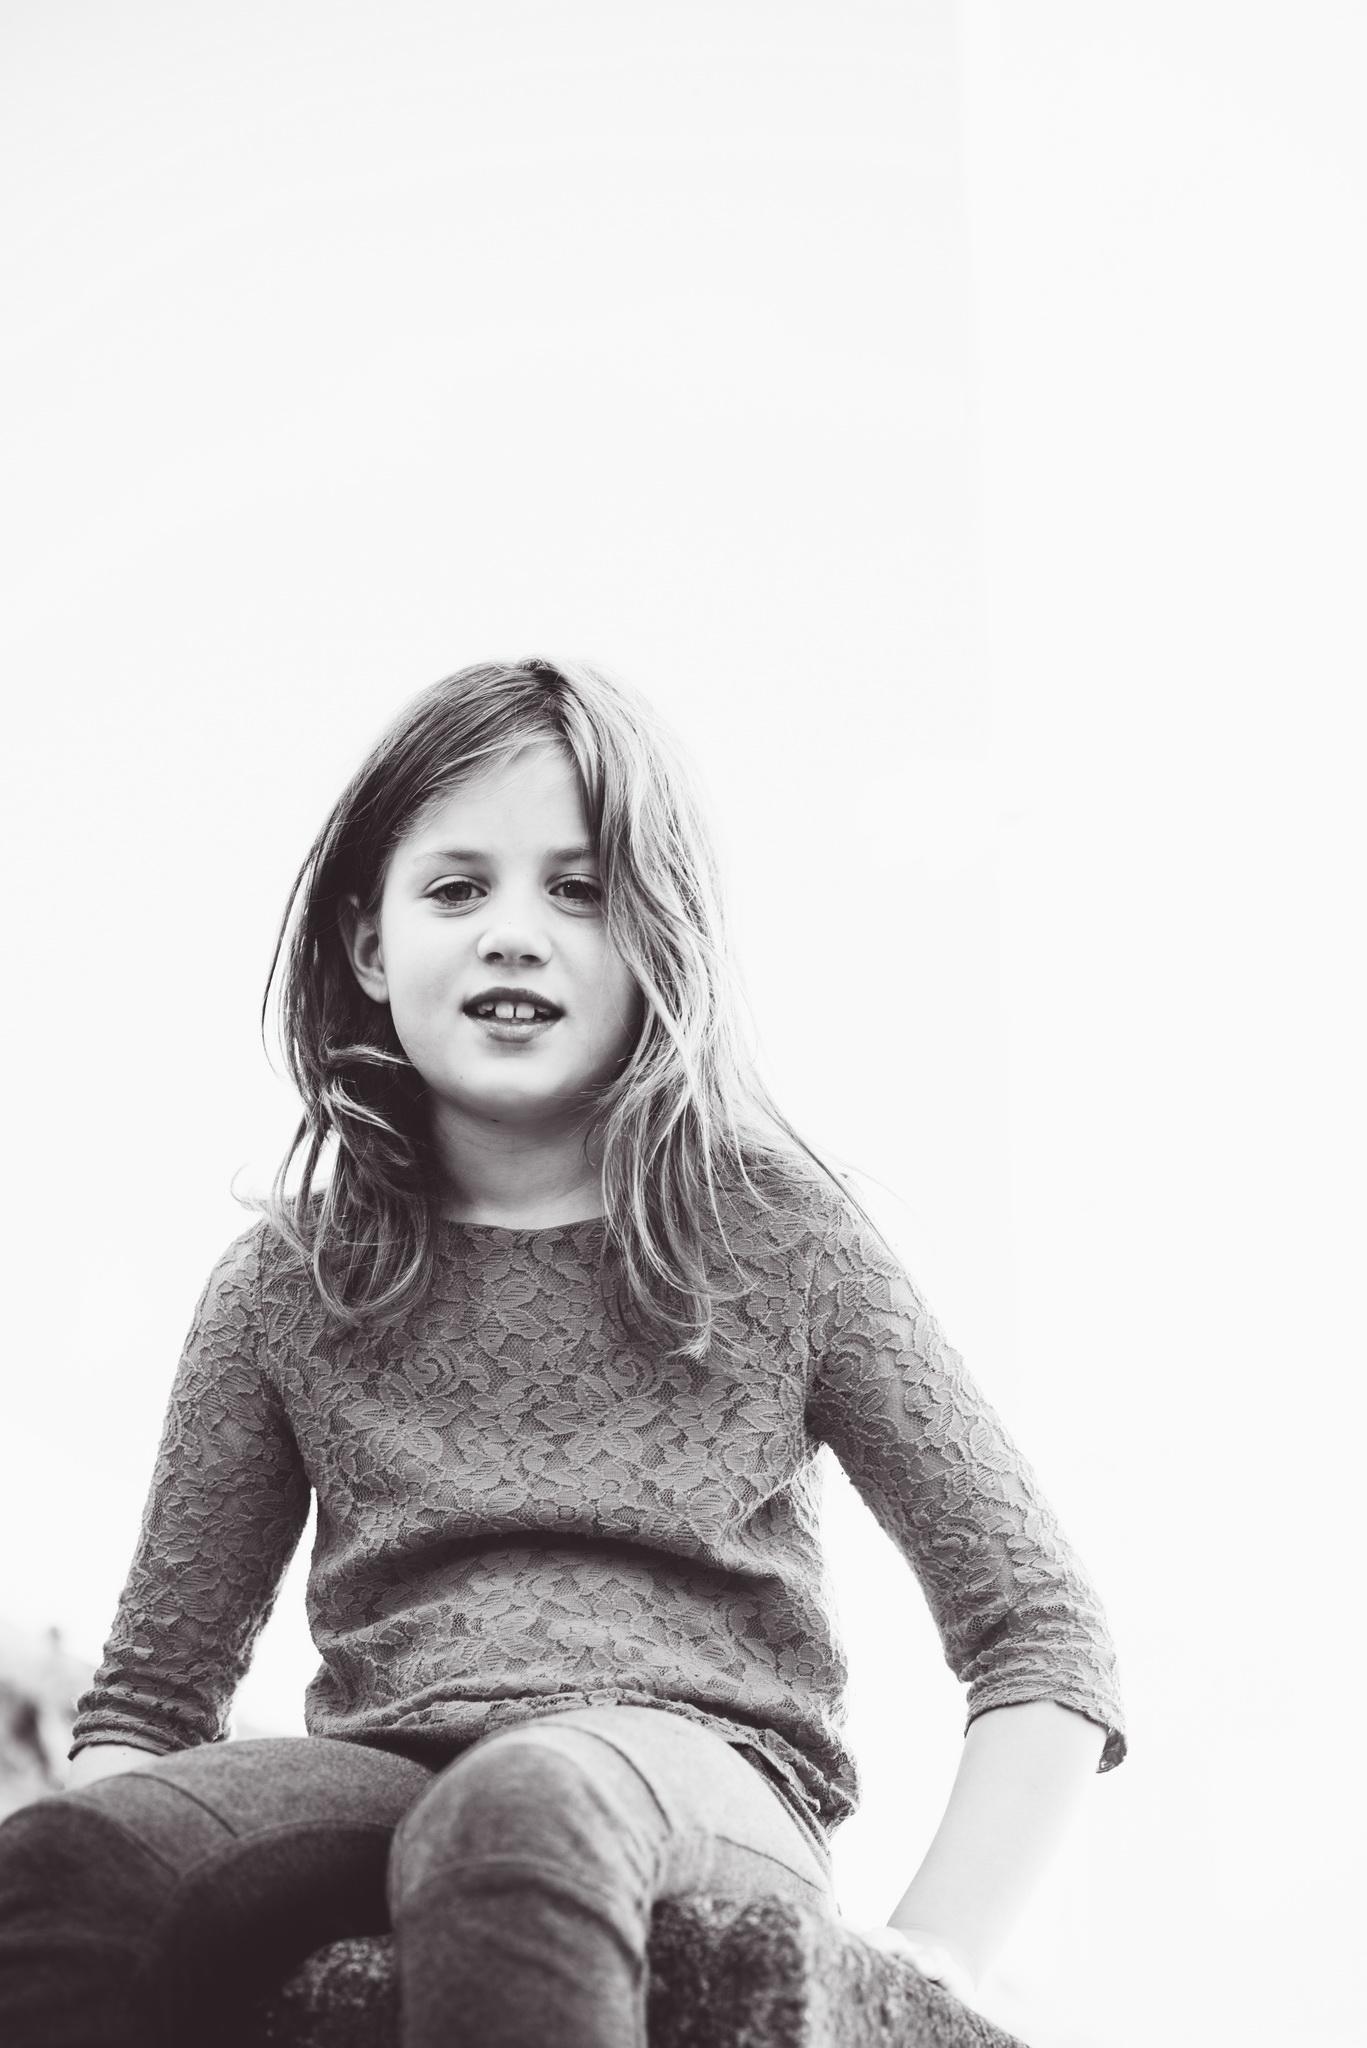 Paula_Weisz-182_Bildgröße ändern